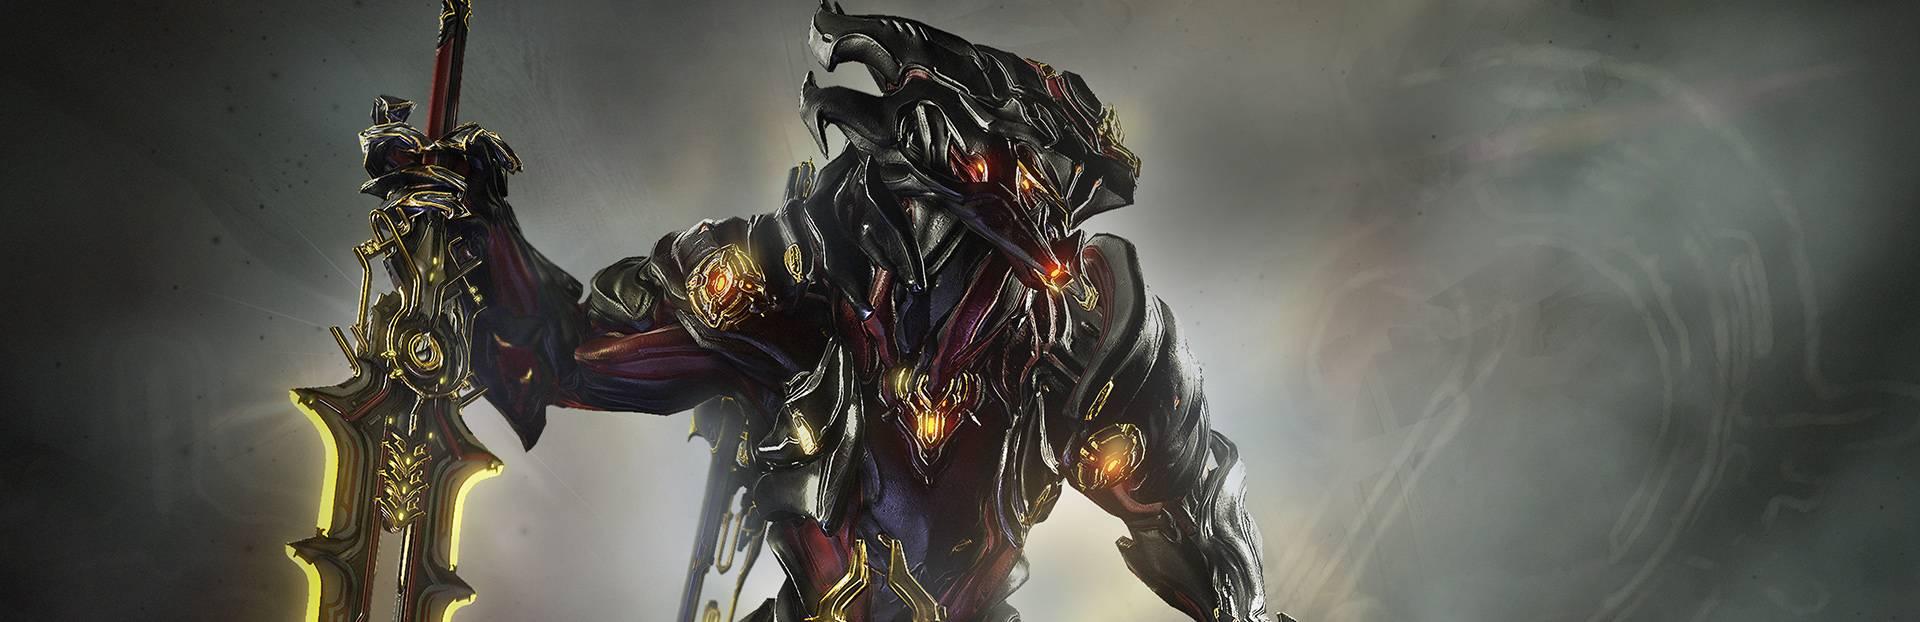 chroma prime build